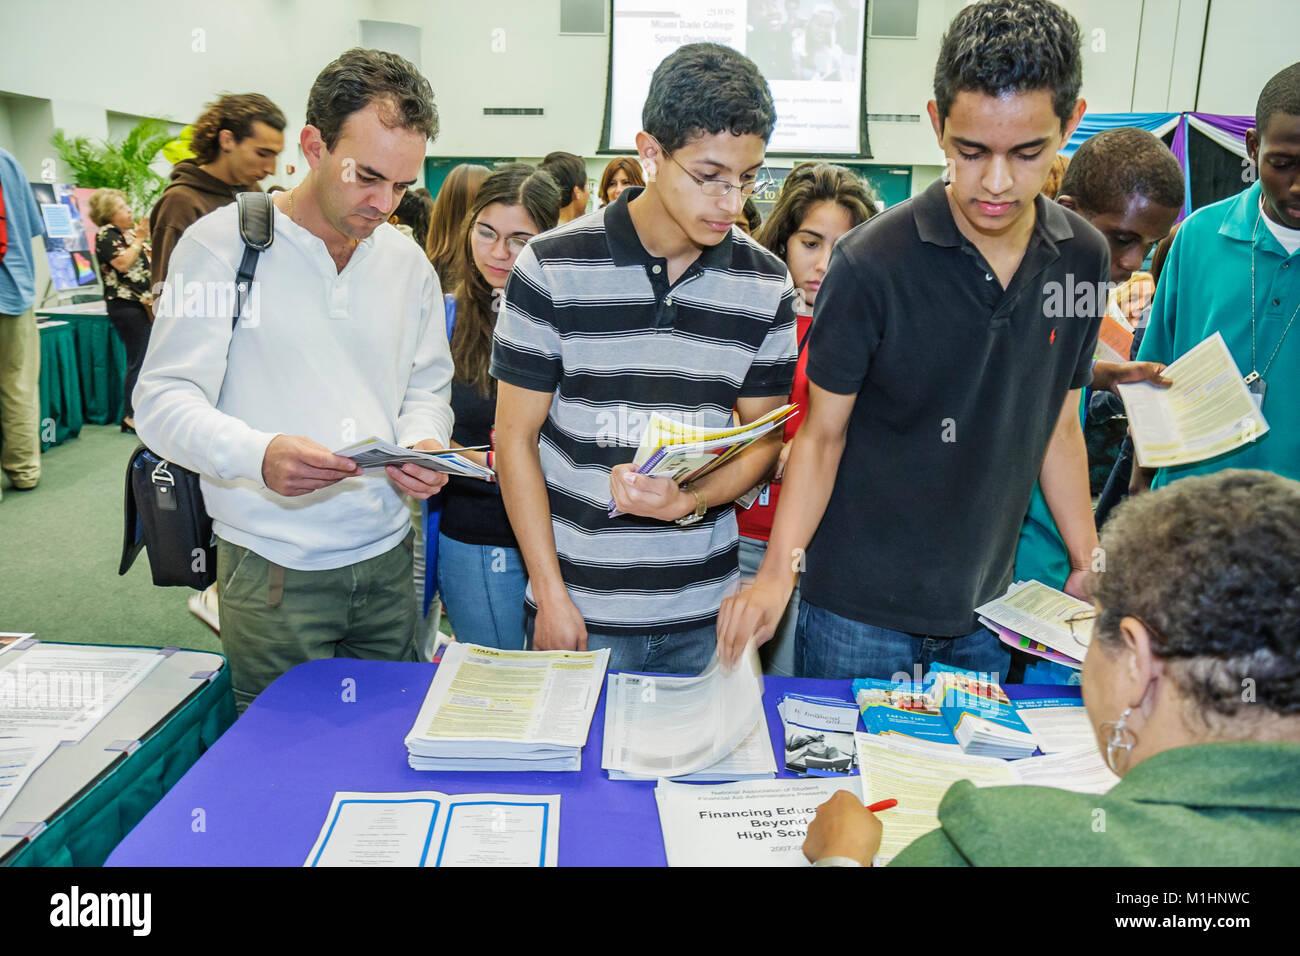 courses recruiter orientation counselor Hispanic teen boys man information - Stock Image